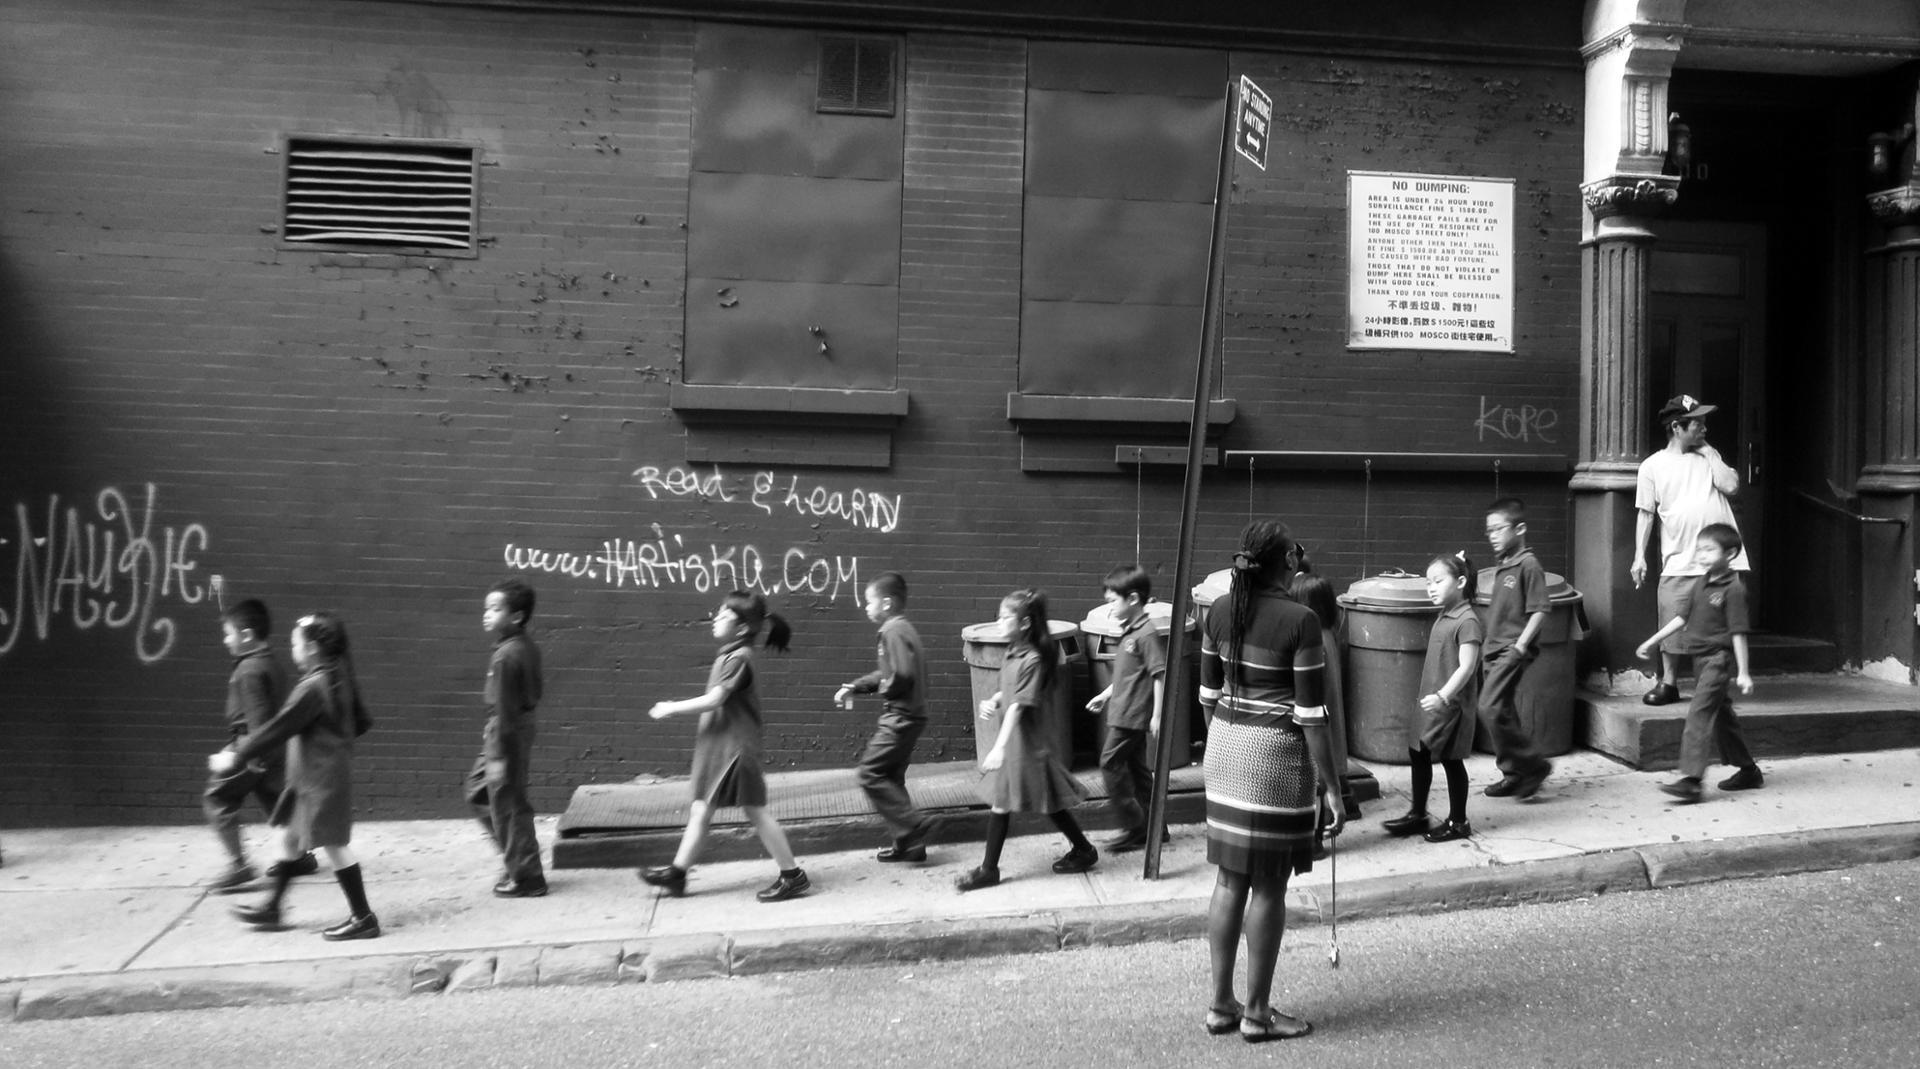 School time, New-York City, 2014